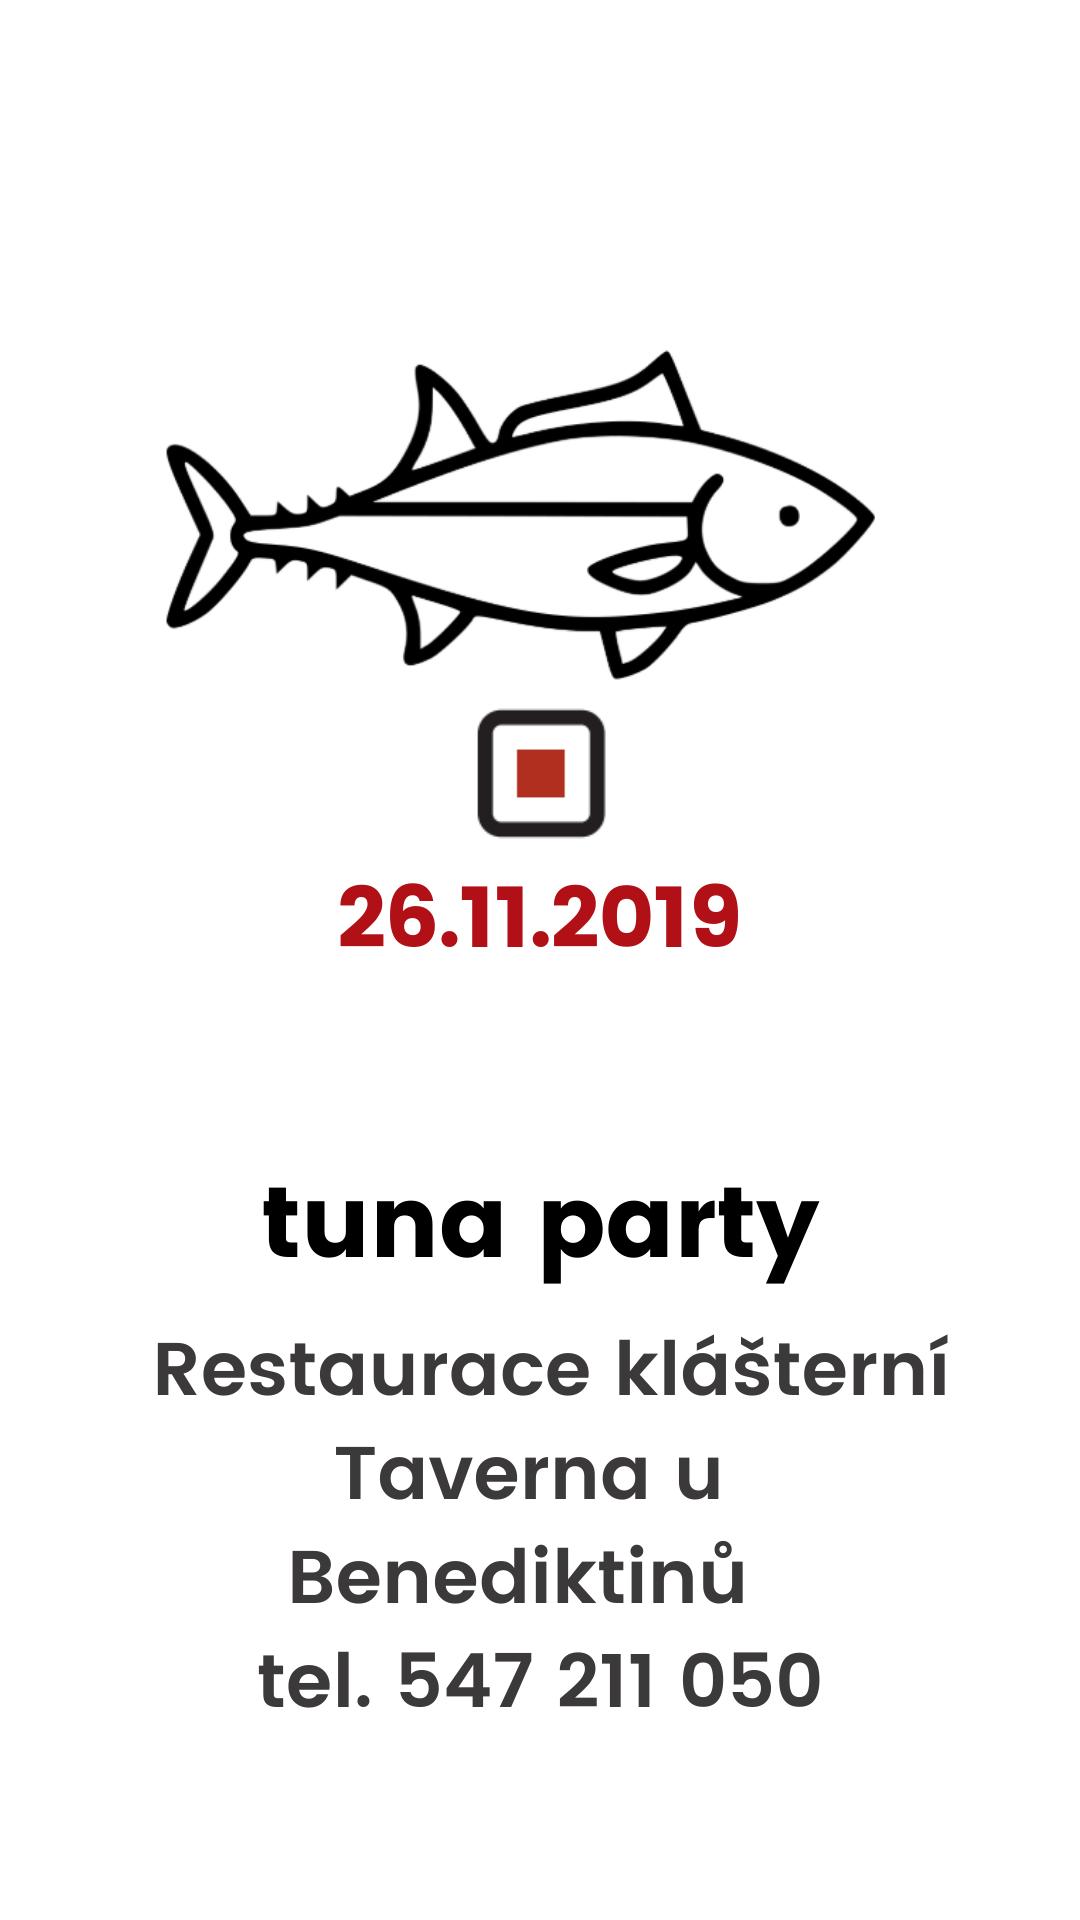 tuna party new